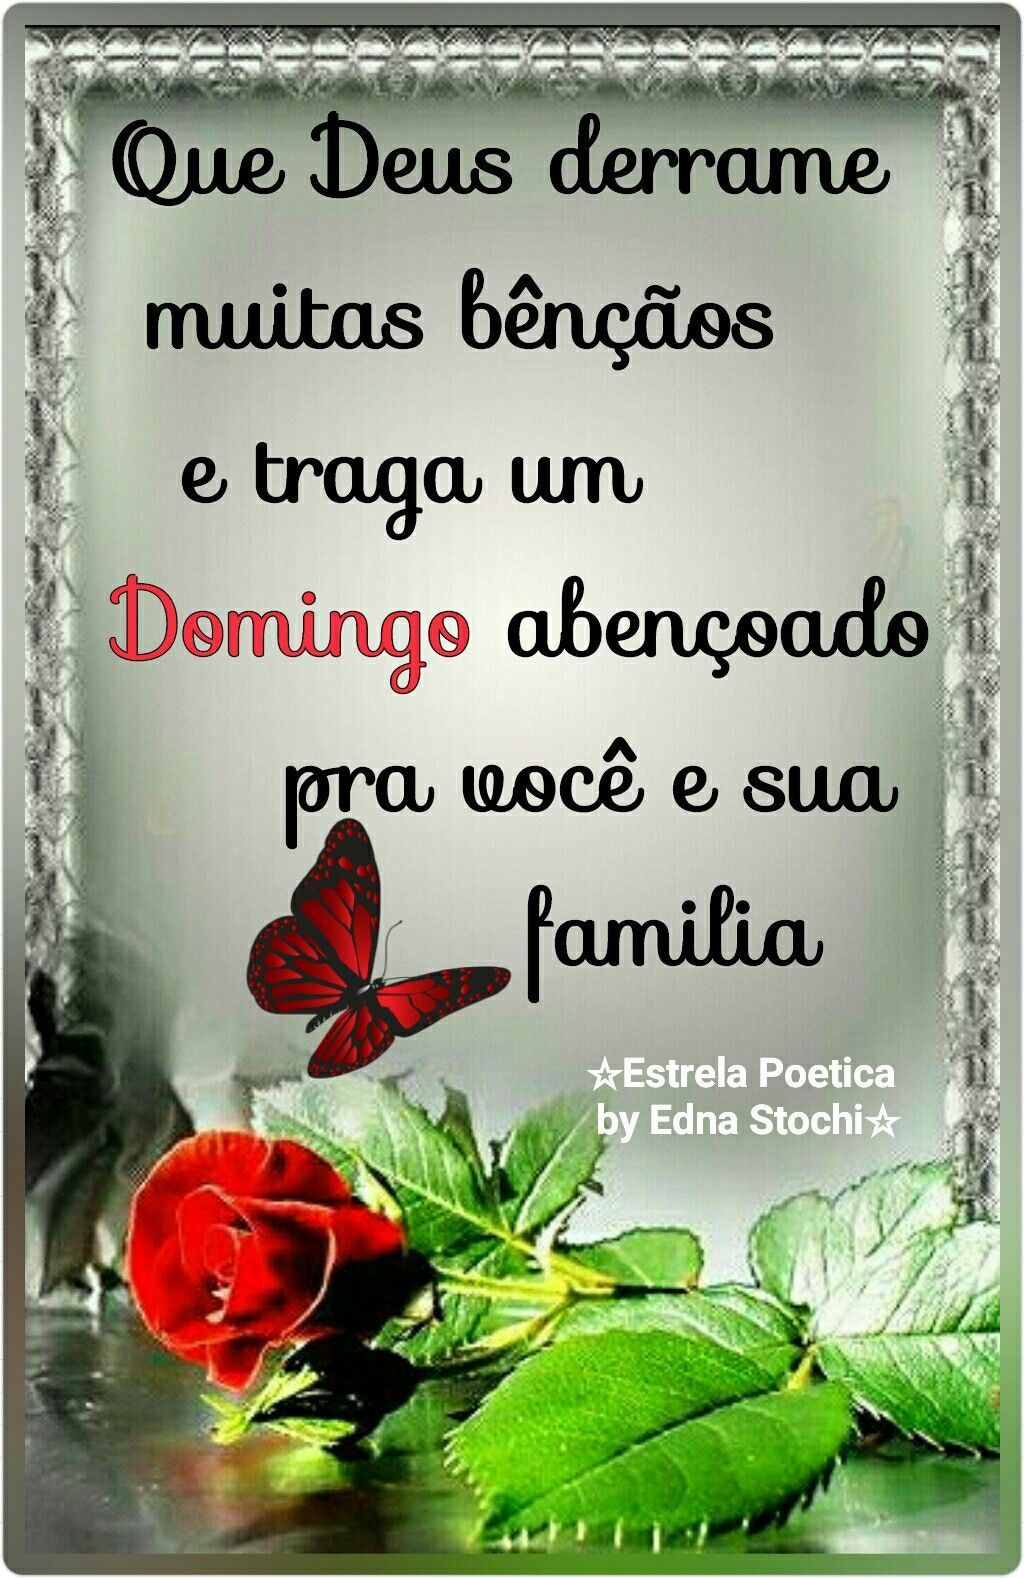 Domingo Feliz Bomdia Boatarde Boanoite Amigos Deus Frases